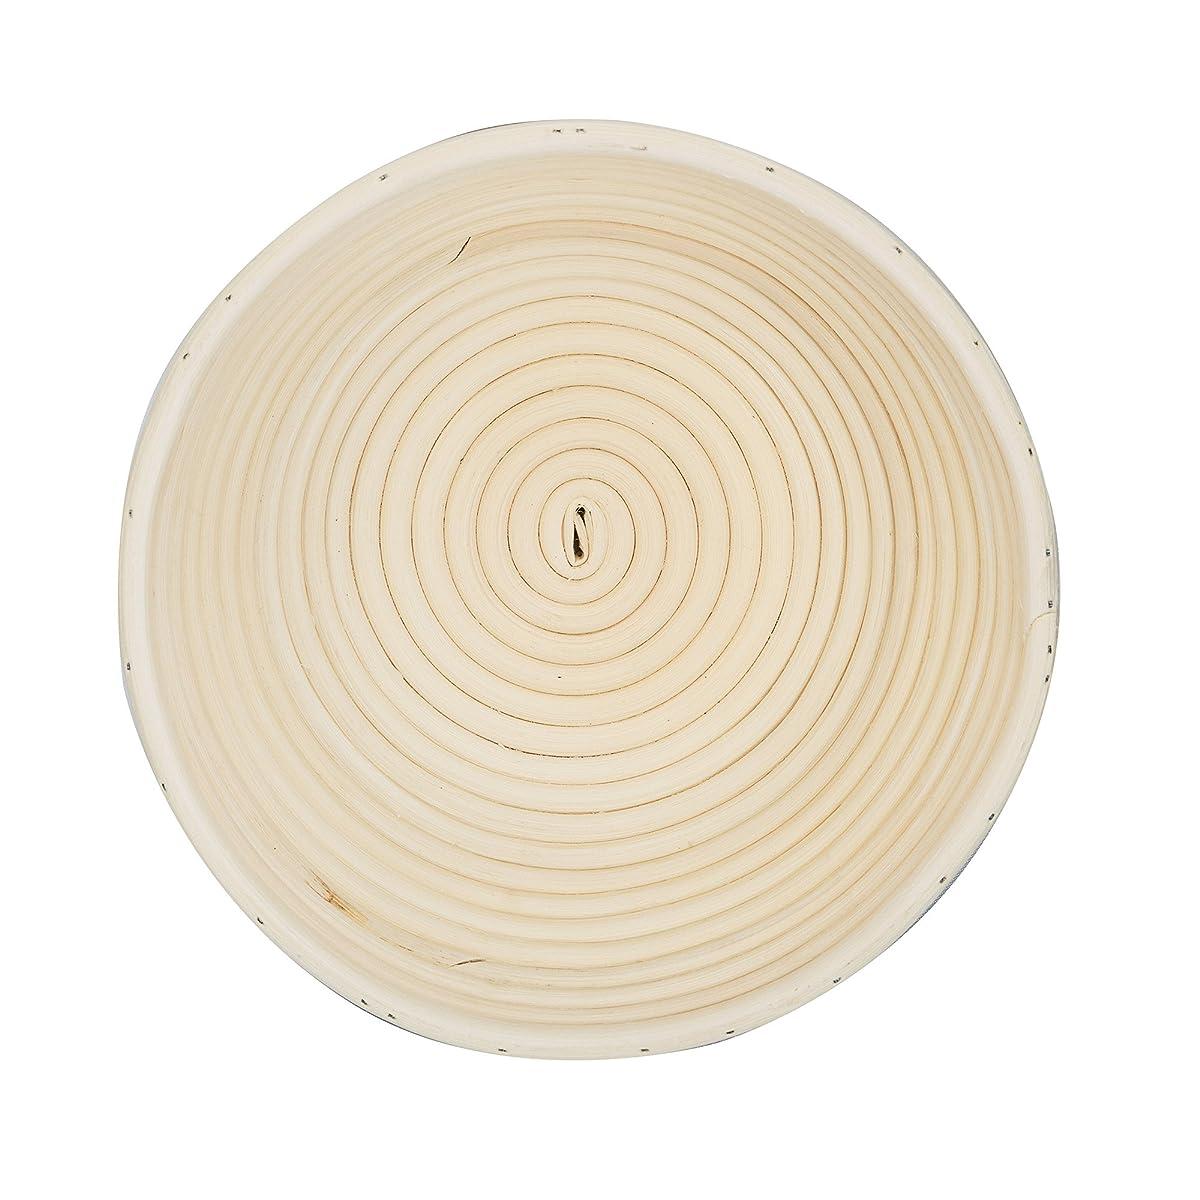 "DOYOLLA 1pcs 8.5"" Round Banneton Brotform Bread Dough Proofing Rising Rattan Basket & Liner"